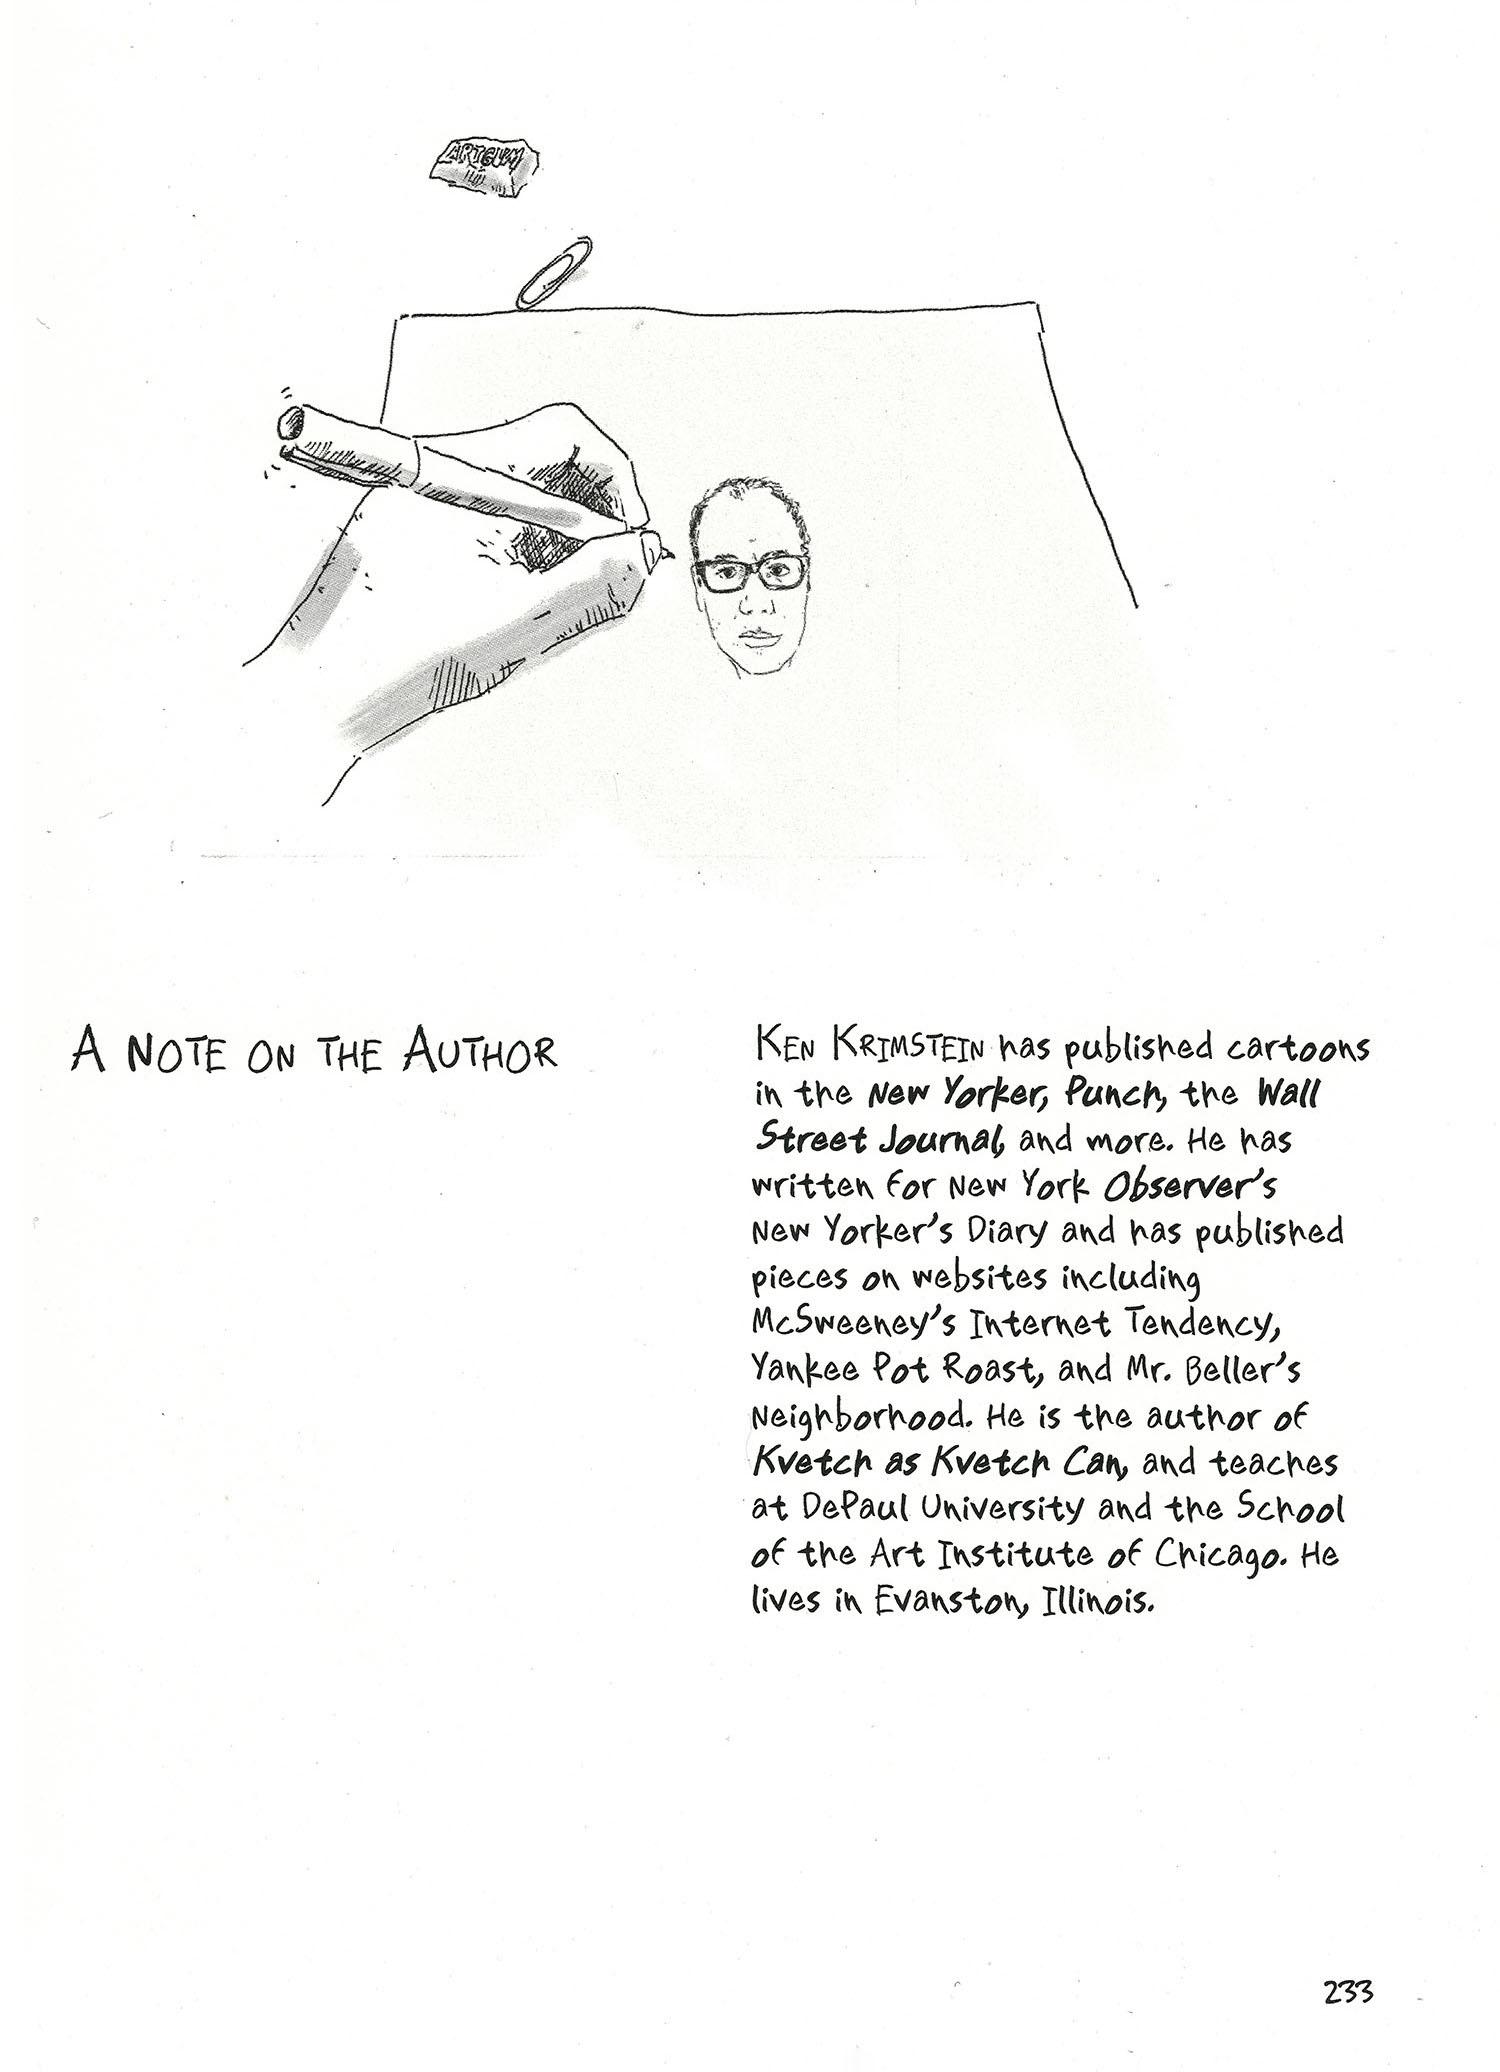 A hand draws a portrait of Ken Krimstein. His bio appears below the drawing.